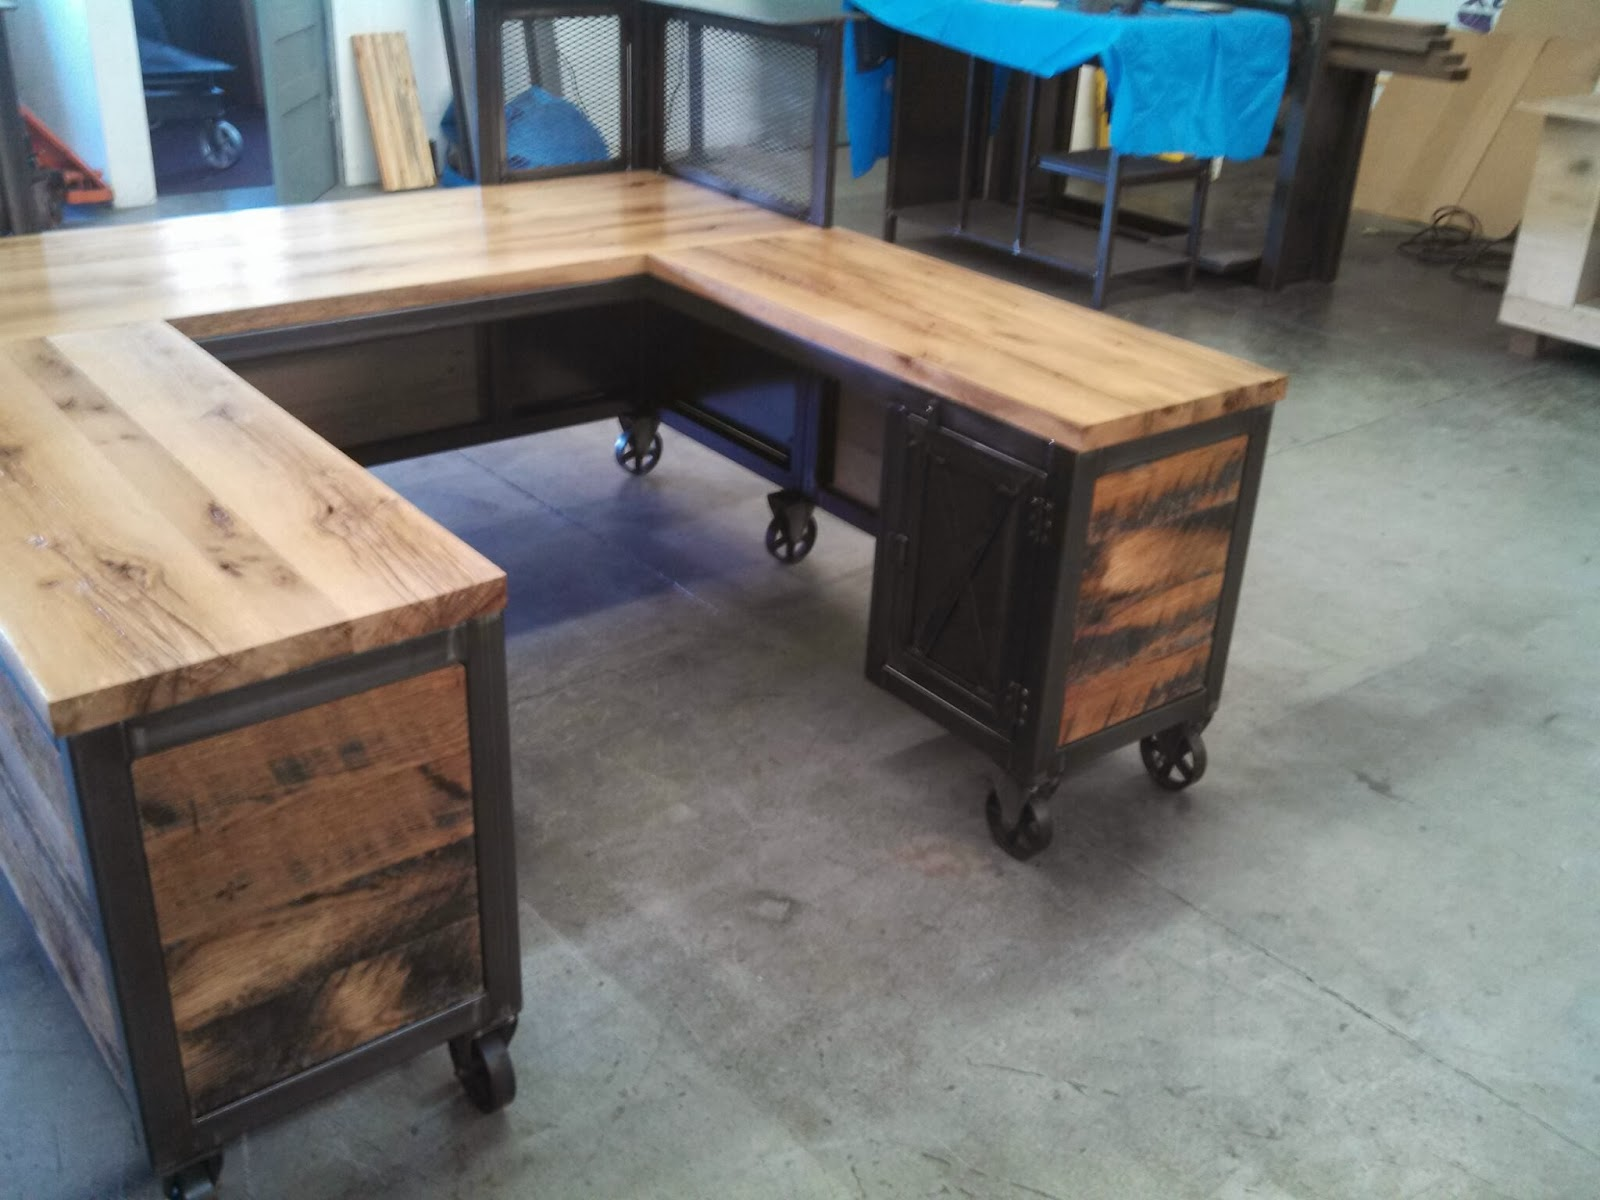 Real Industrial Edge Furniture llc: Industrial reception desk.